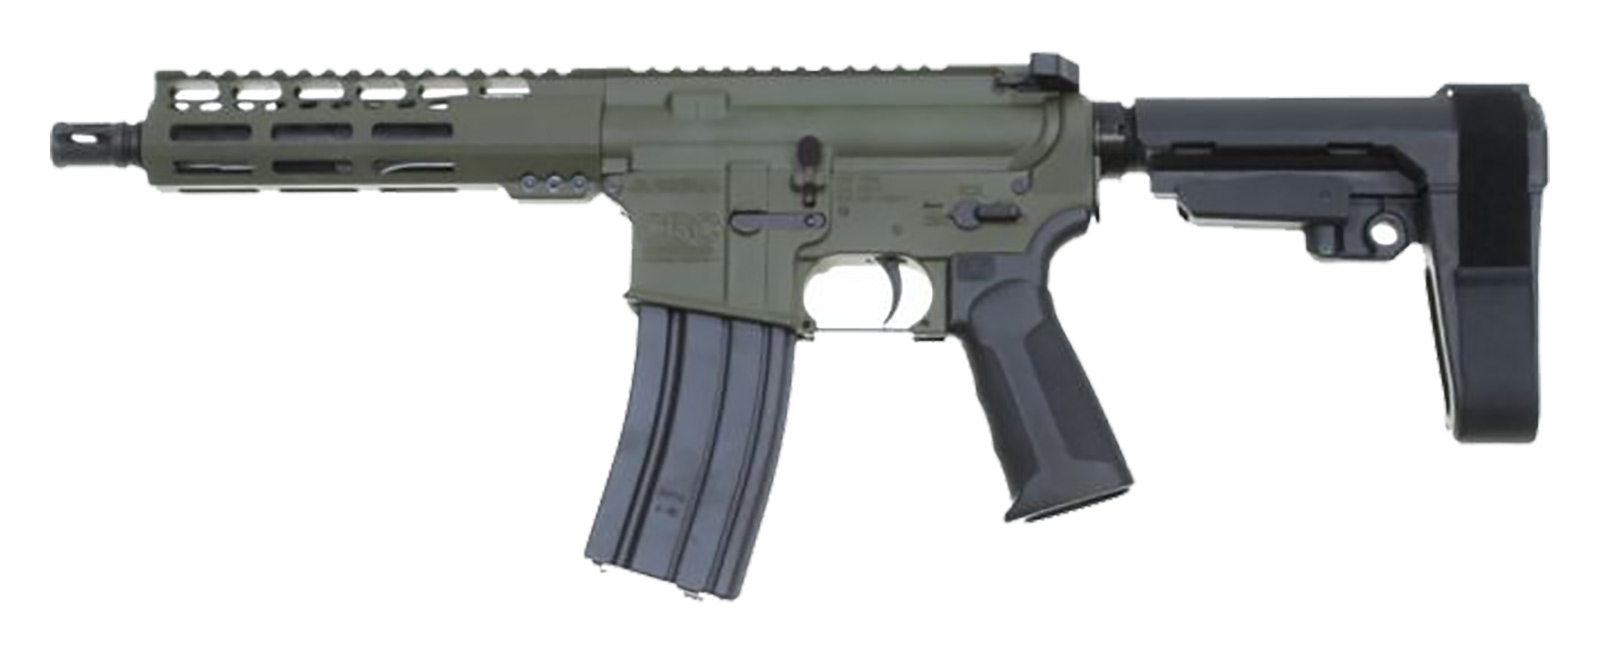 CBC PS2 Forged Aluminum AR Pistol - OD Green   5 56 NATO   7 5